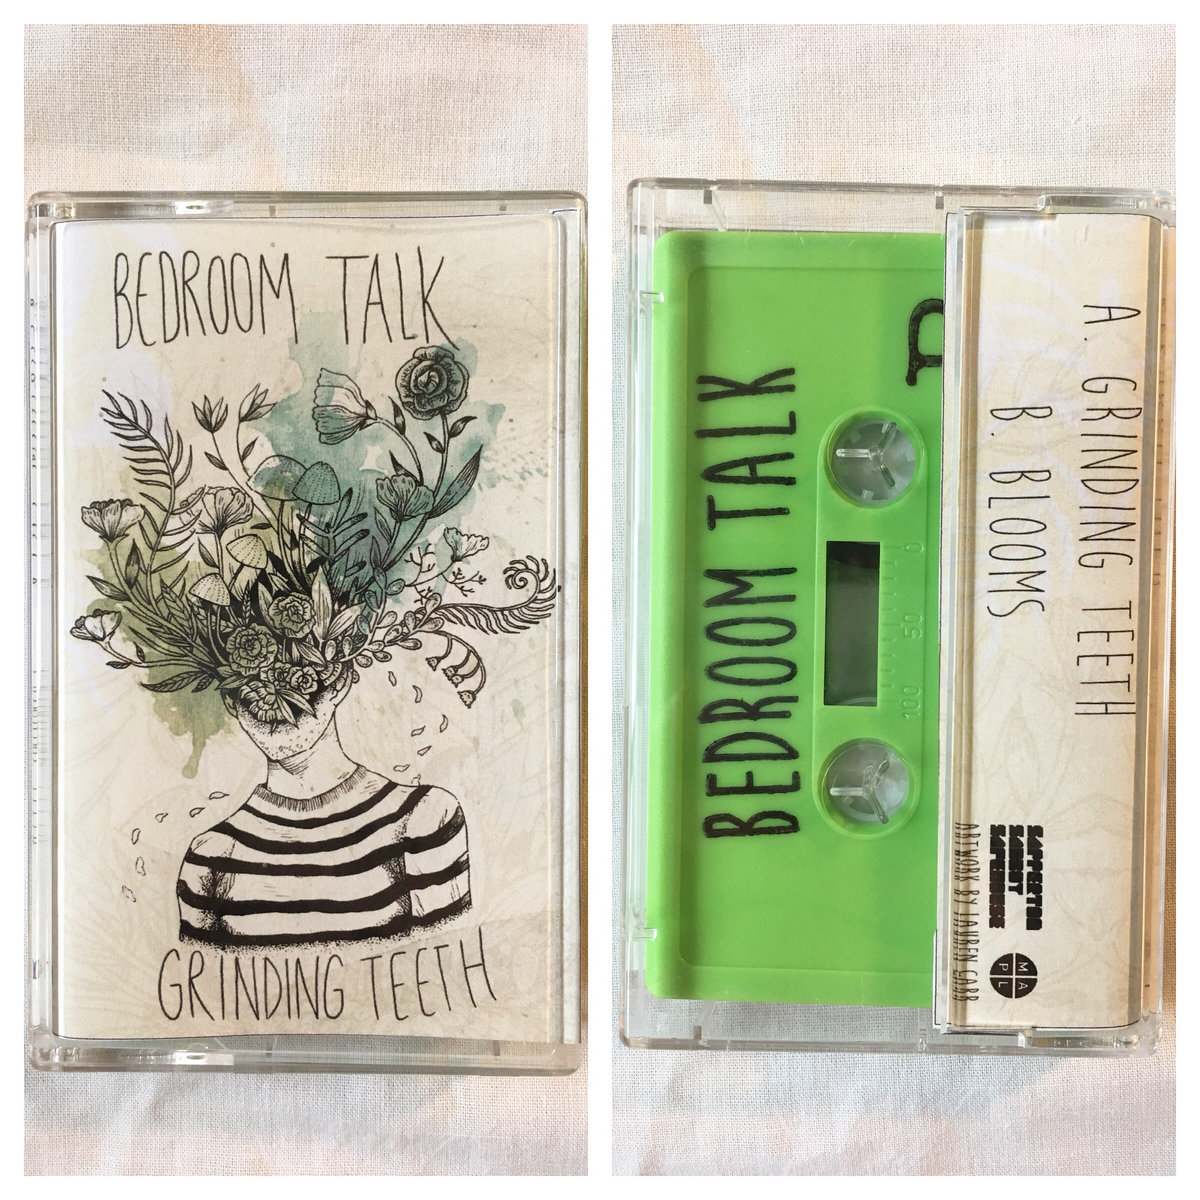 Bedroom Talk  Grinding Teeth EP  Limited Edition Cassette. Grinding Teeth   Bedroom Talk